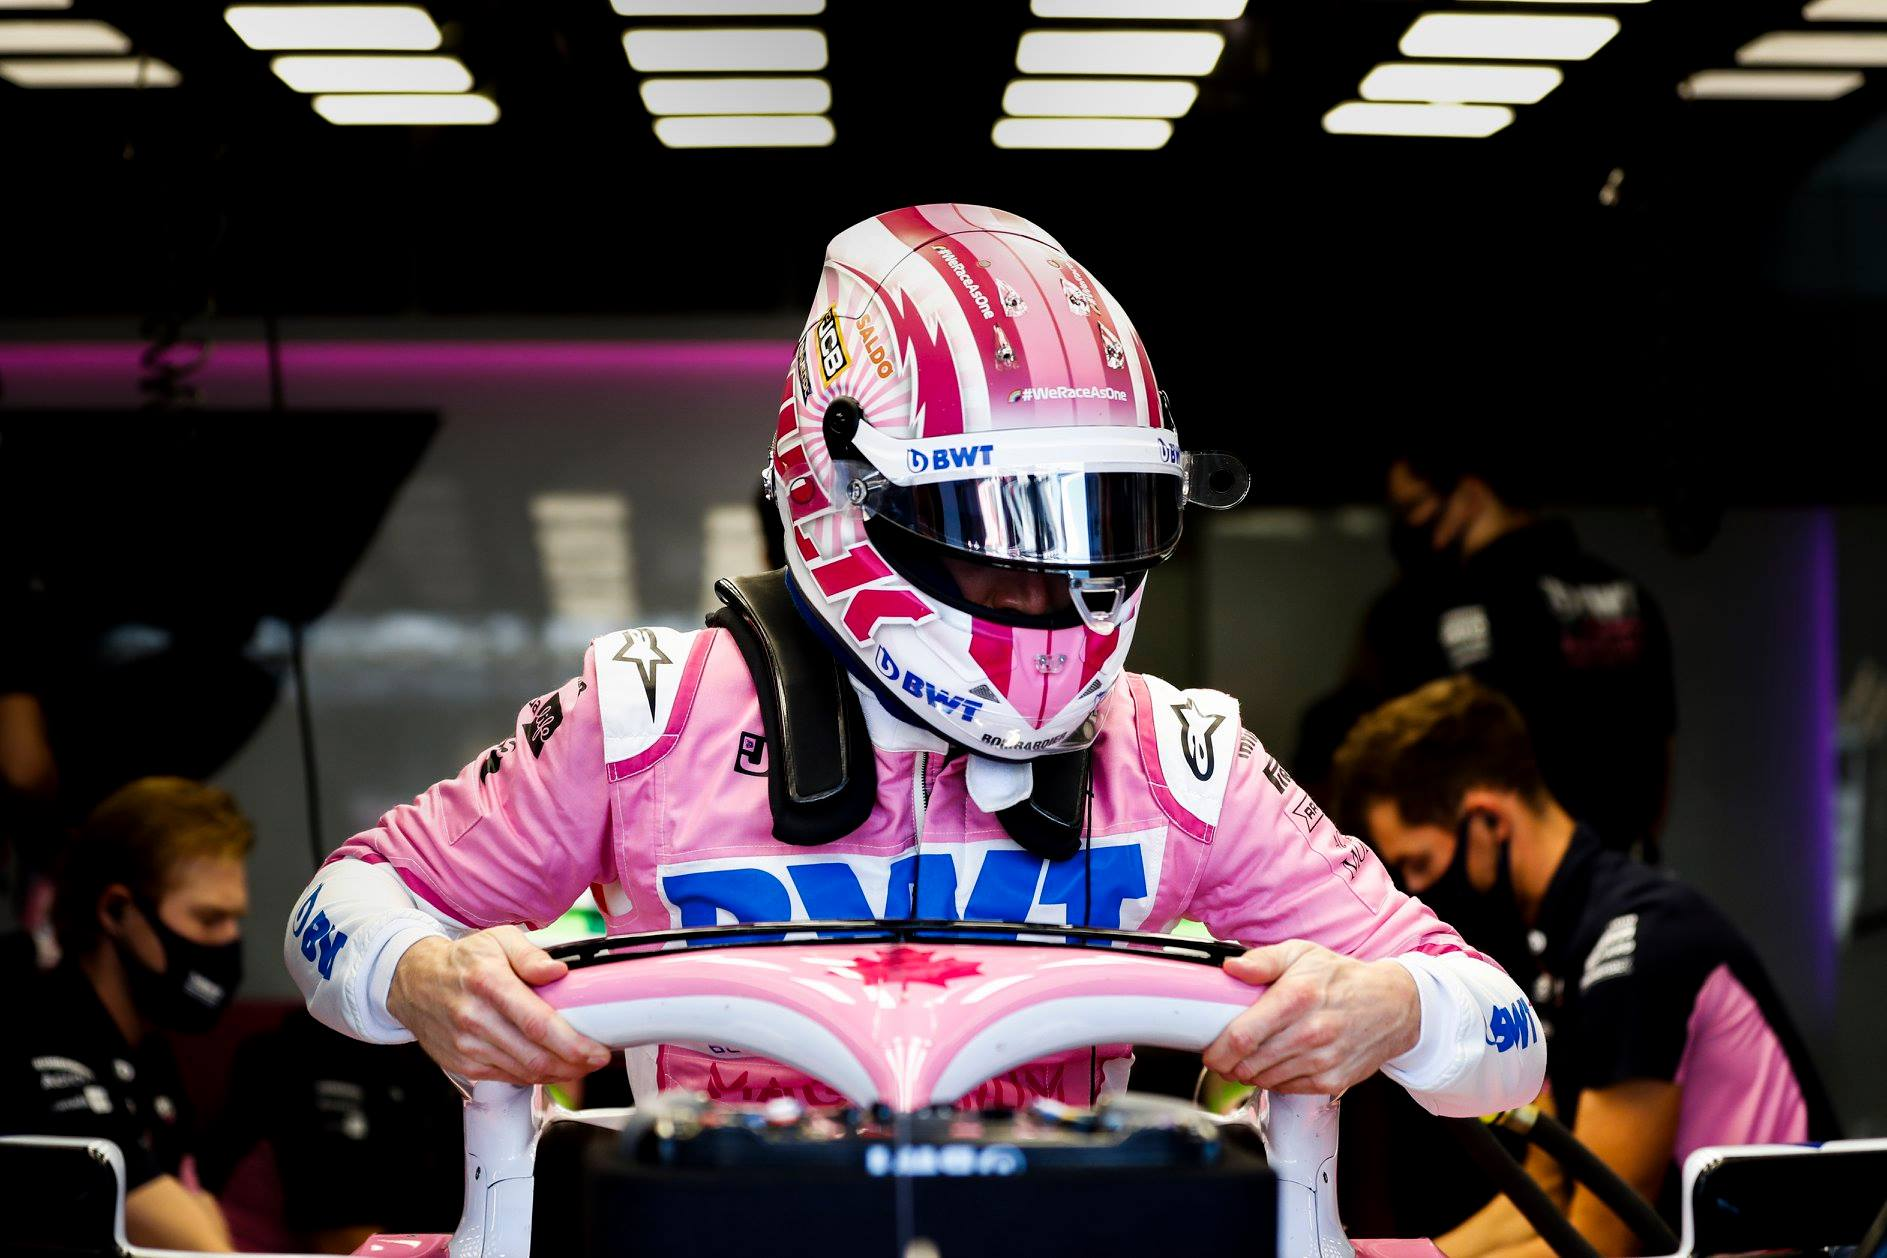 F1, F1 Nation, Nico Hulkenberg